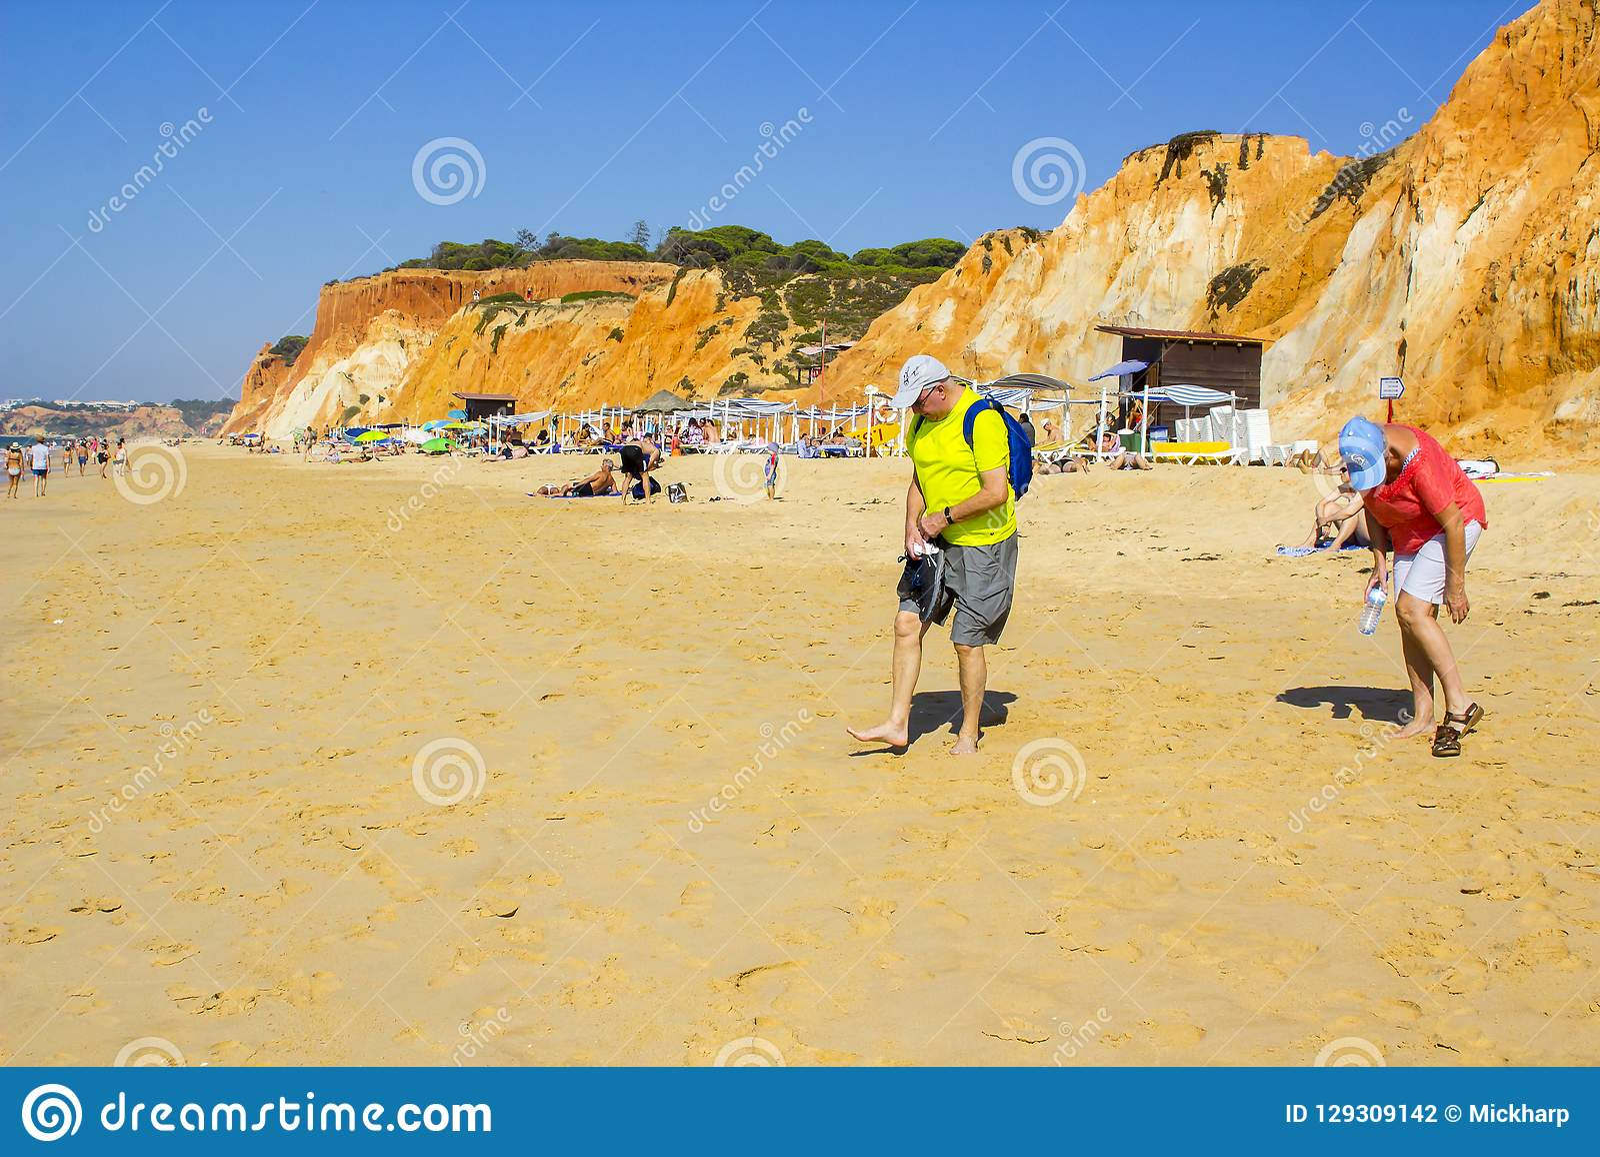 A view along the Falesia Beach in Portugal Albuferia